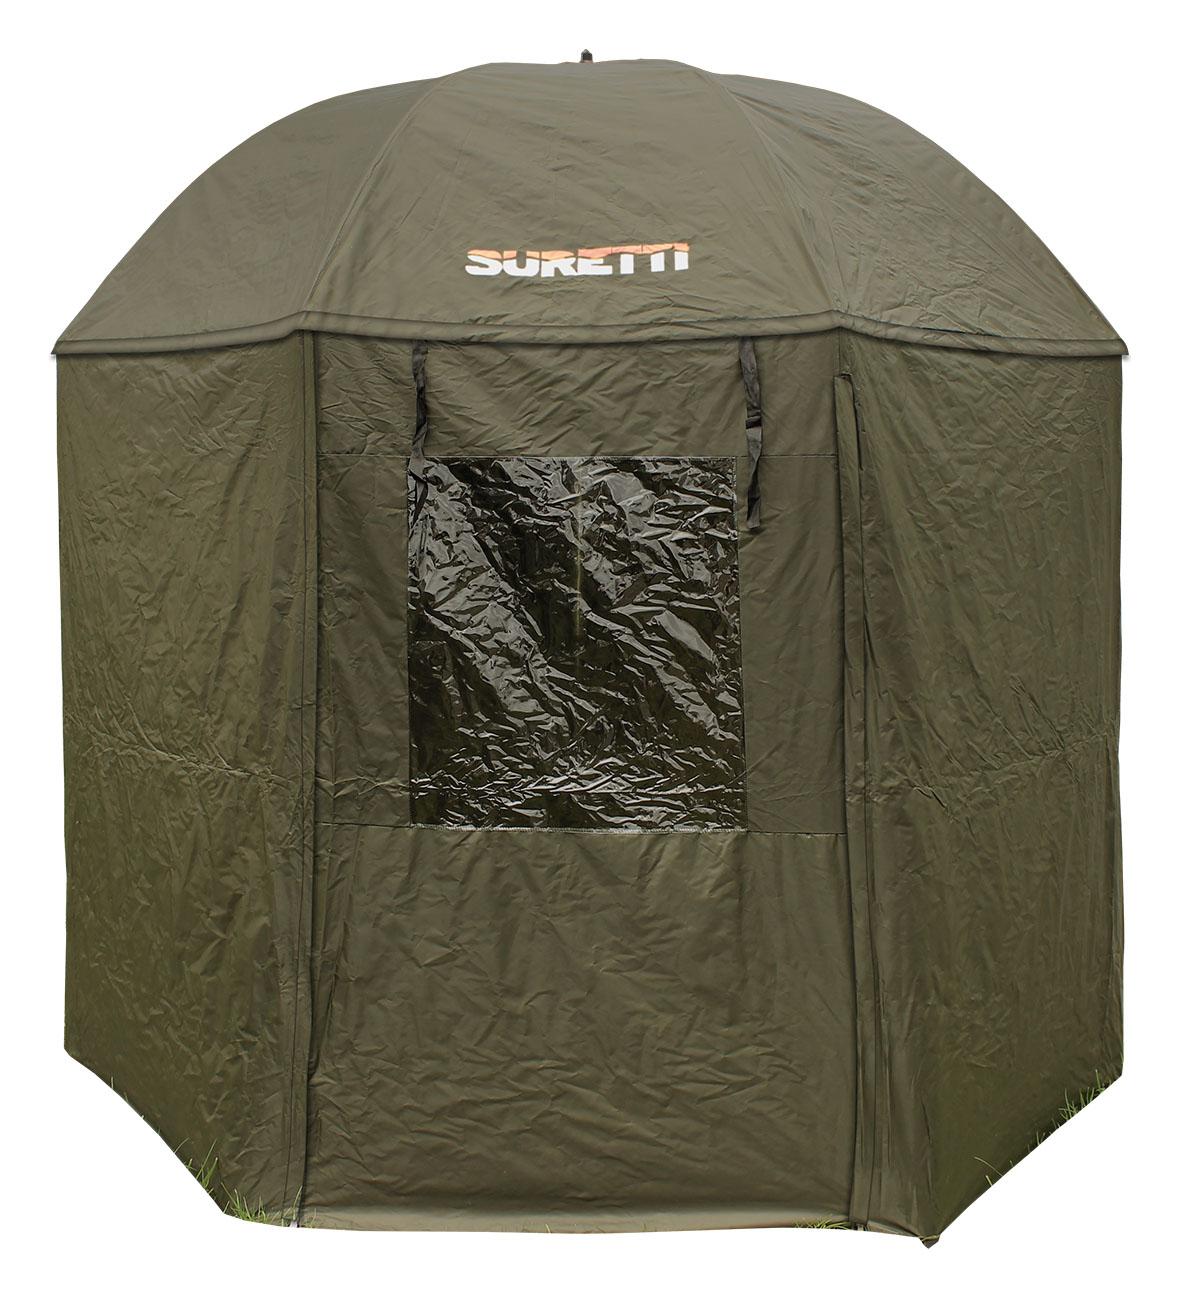 Suretti Deštník s bočnicí Full Cover - PVC